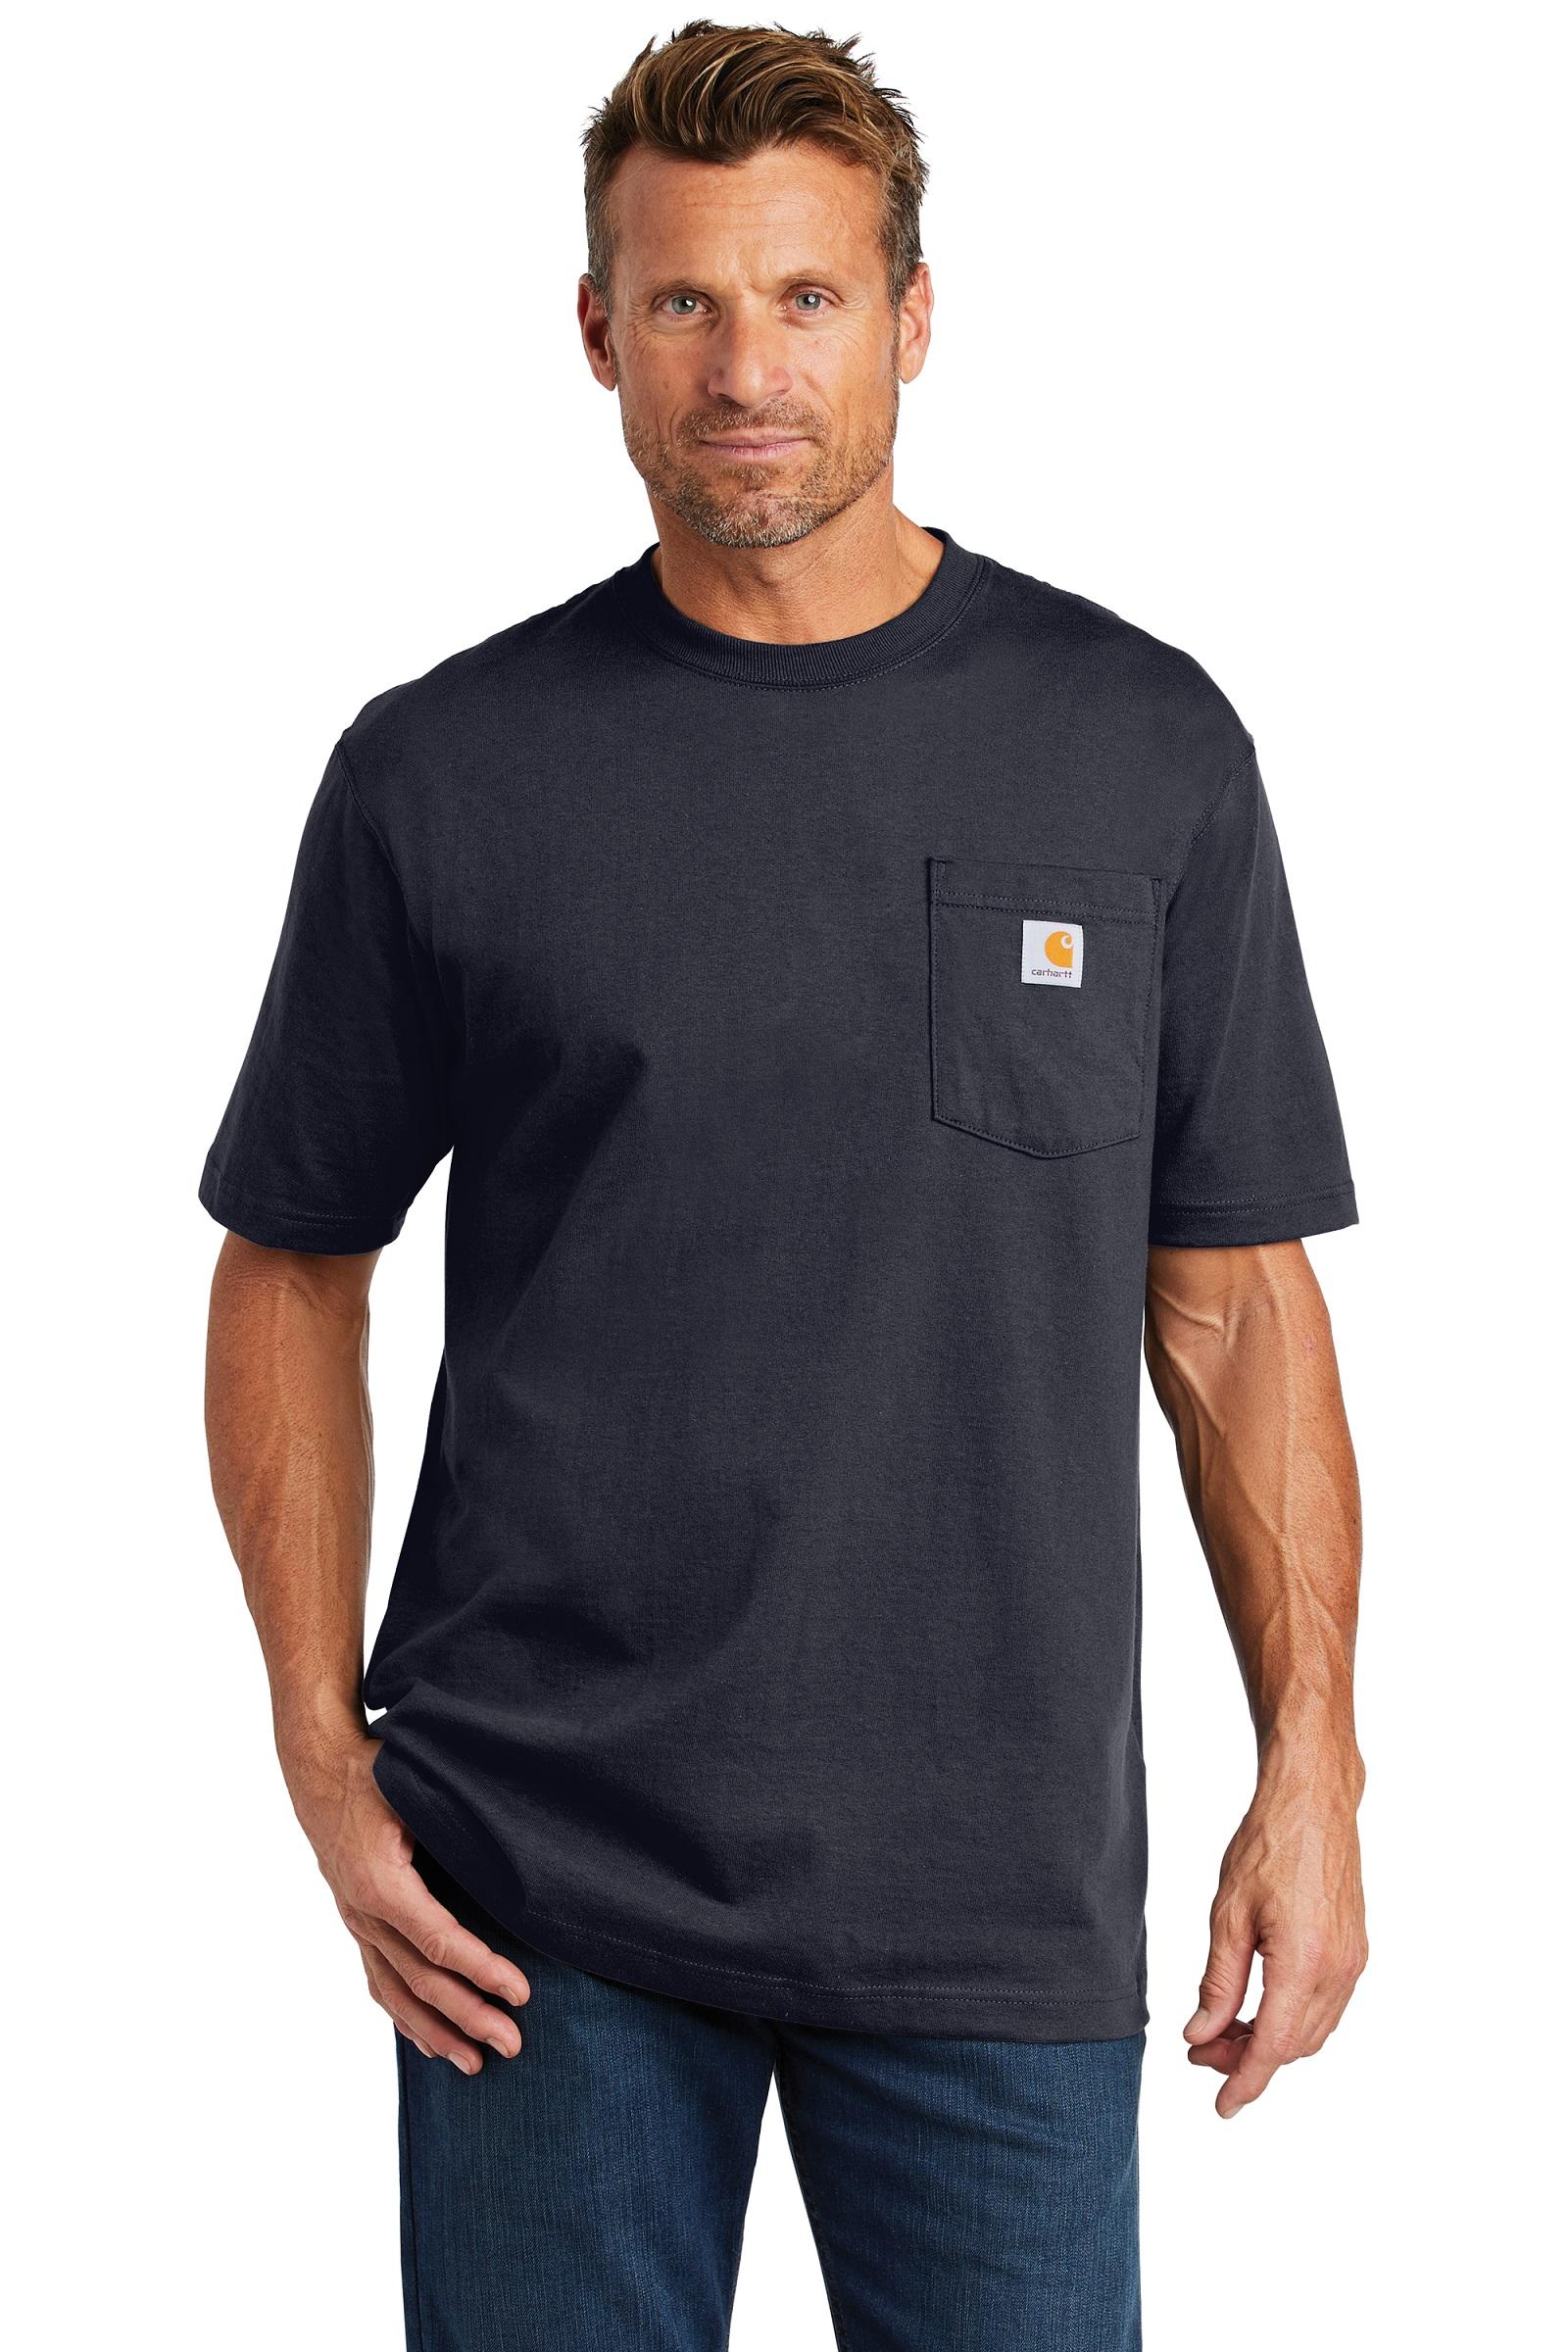 Carhartt Printed Men's Workwear Pocket T-Shirt